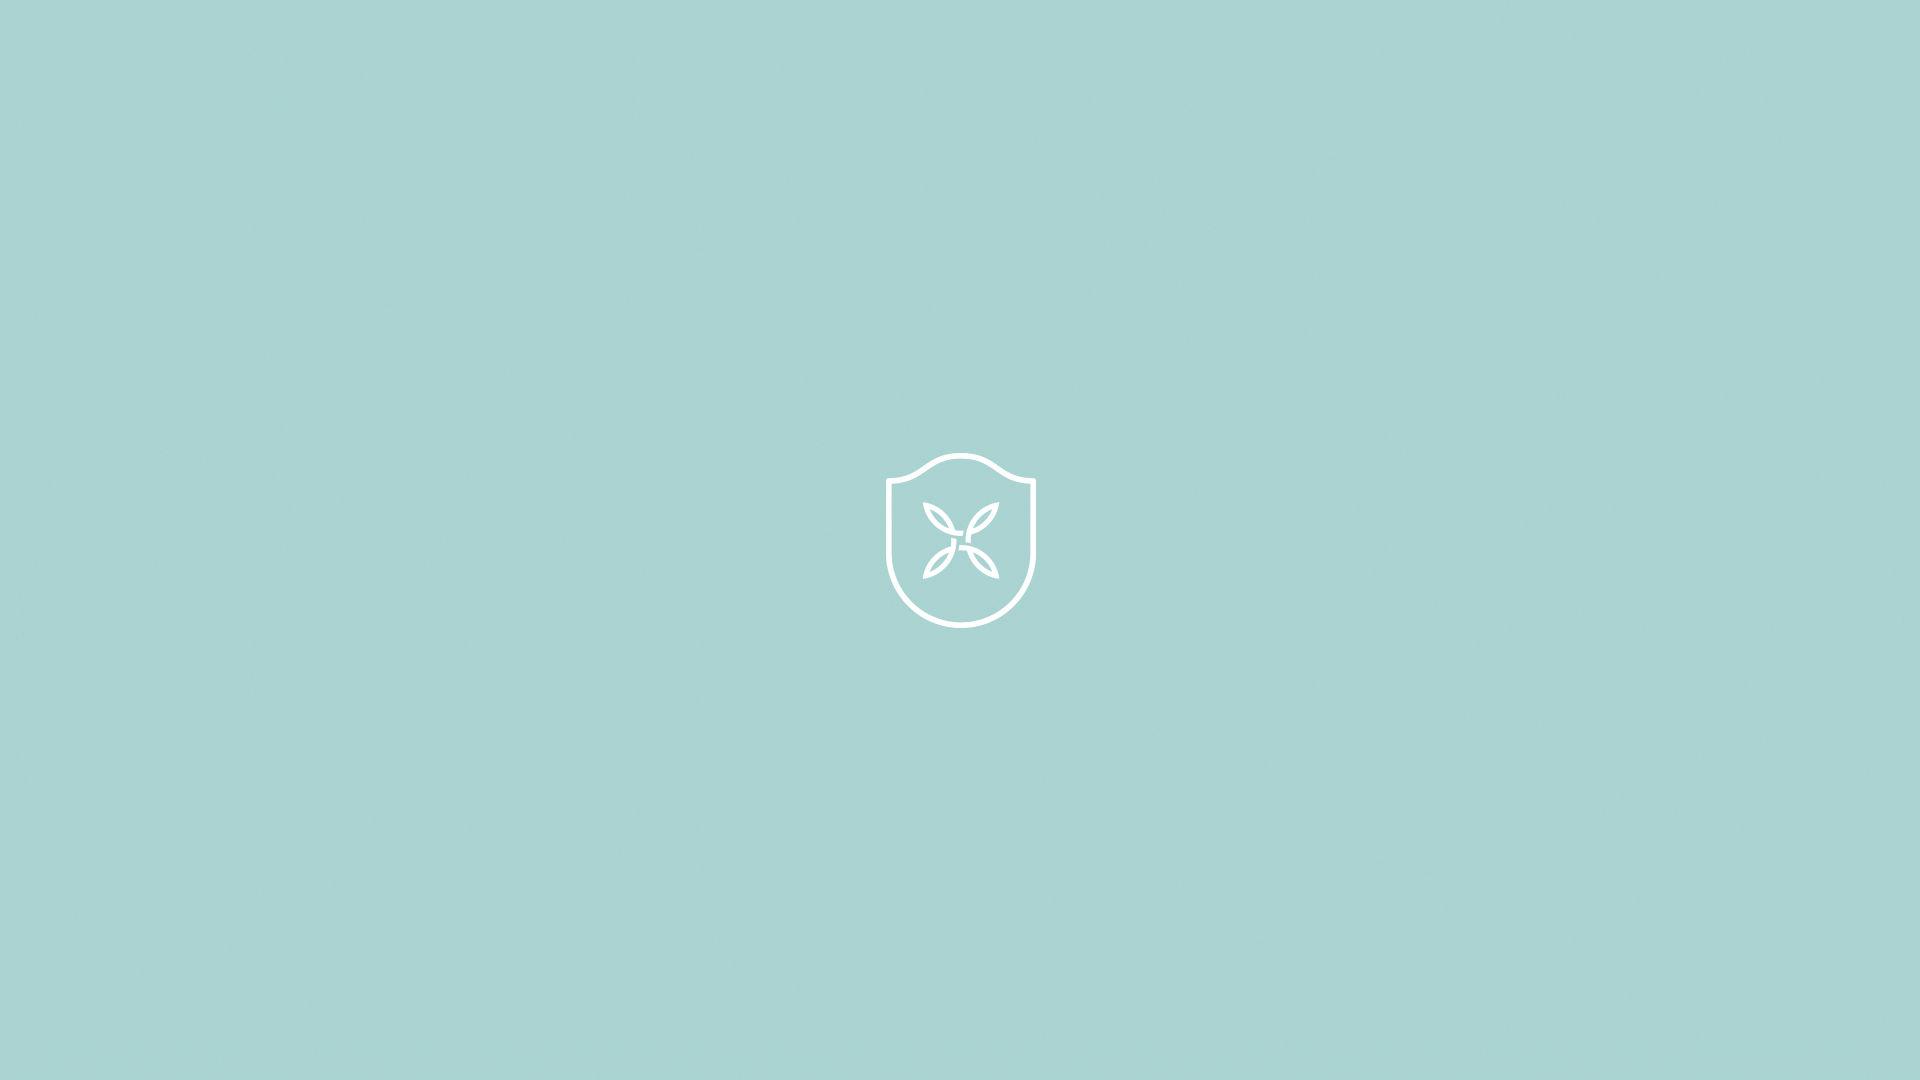 Escudo_flor_monograma CC